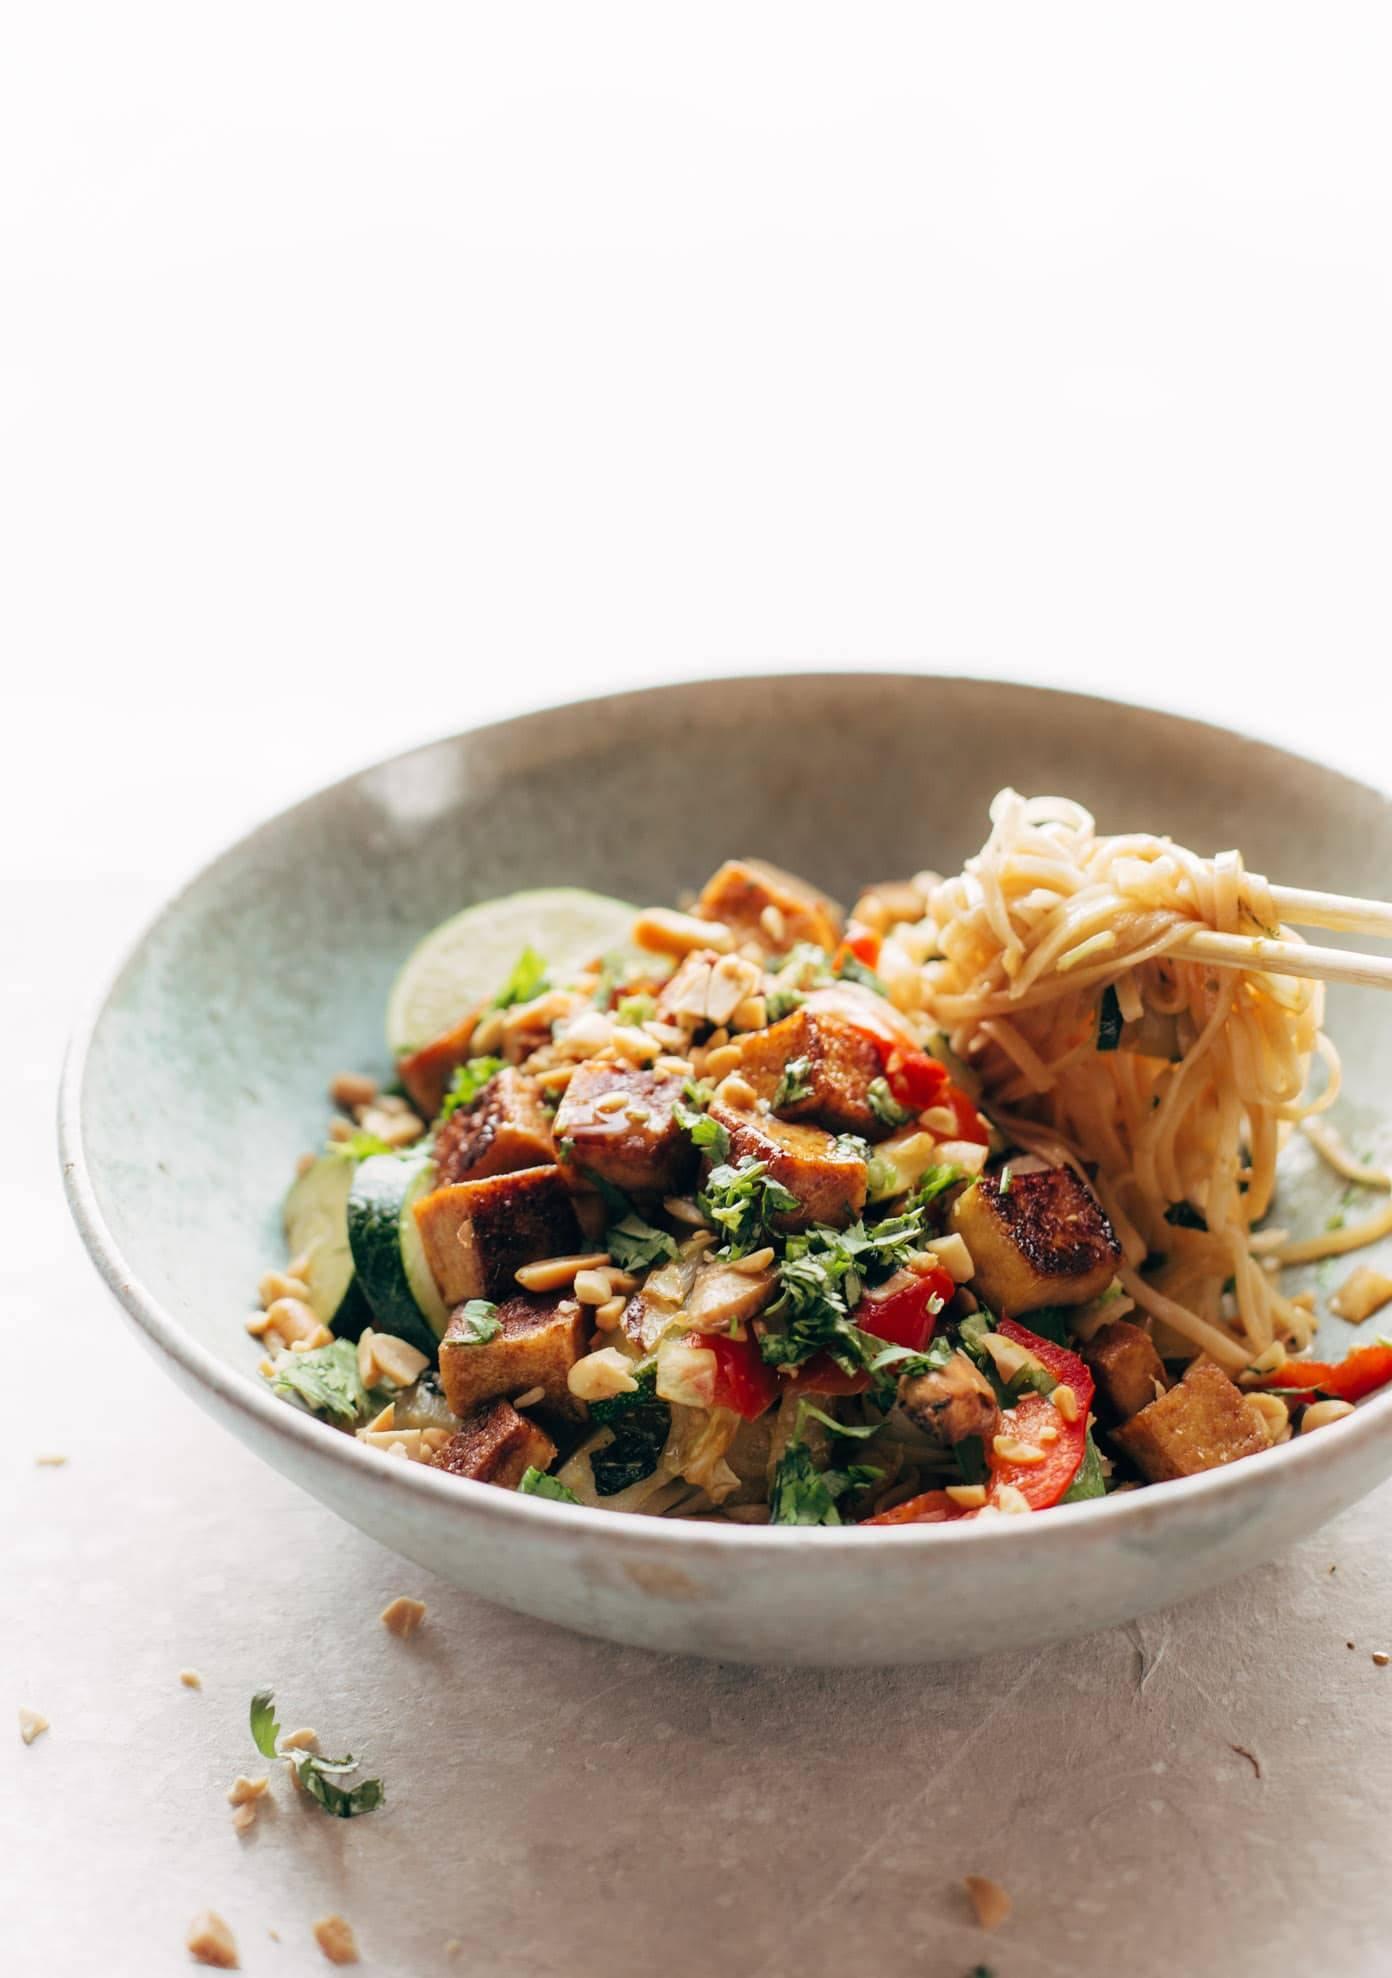 Back Pocket Stir Fry with Noodles in a bowl with chopsticks.